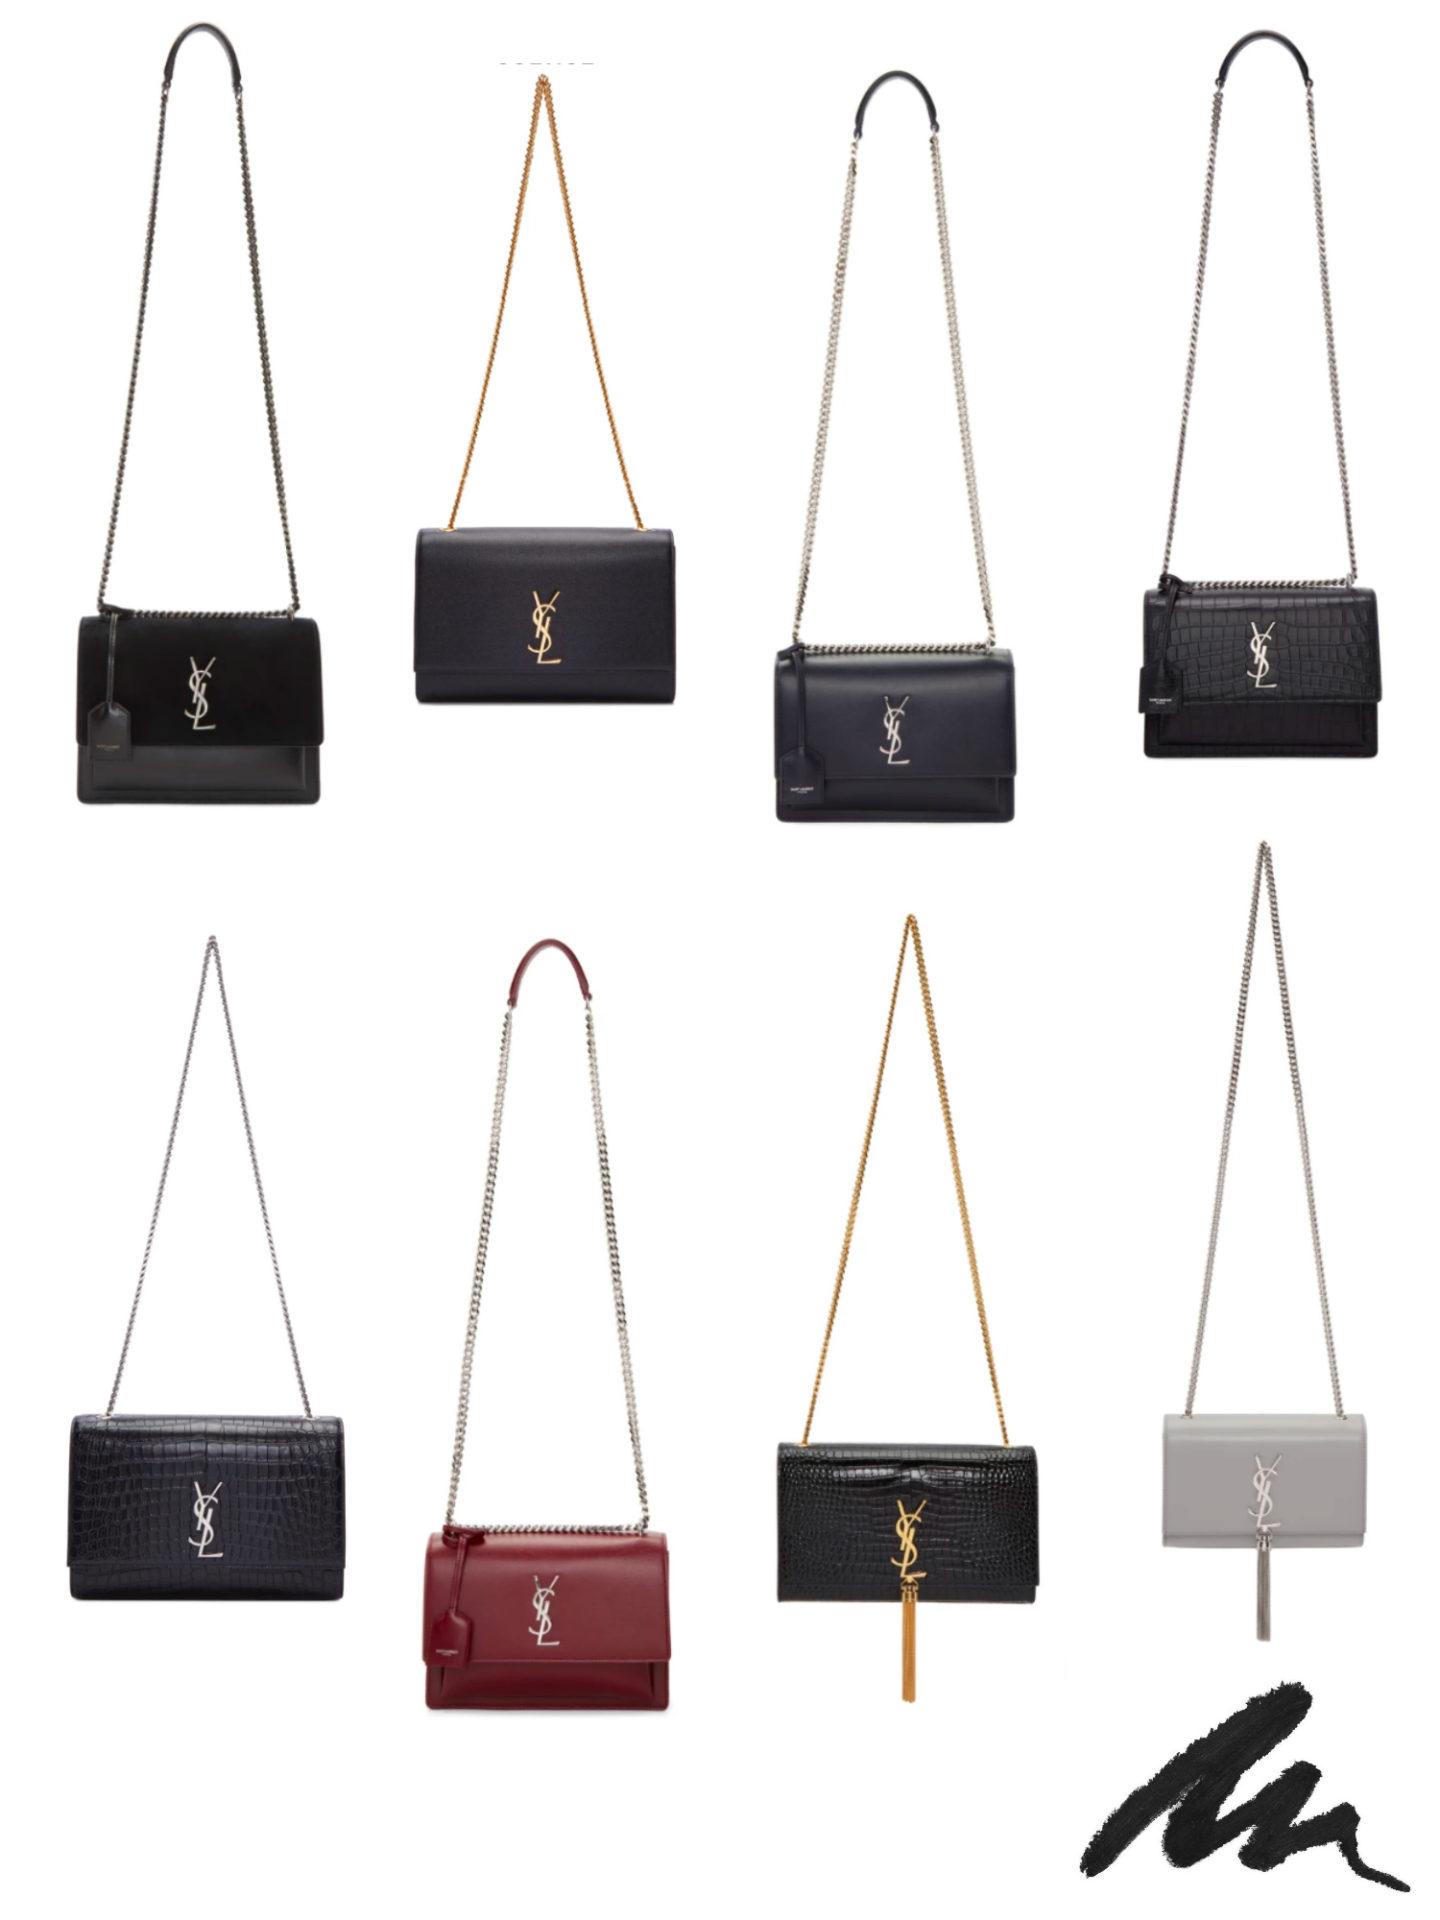 Saint Laurent Handbags for Autumn / Winter